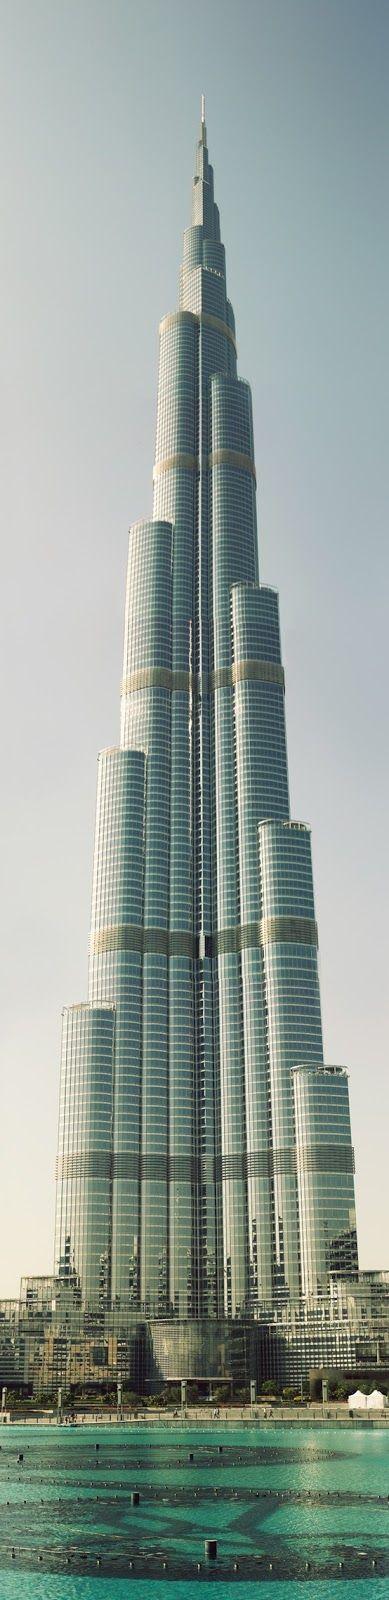 World's tallest building, Burj Khalifa, reopens observation deck